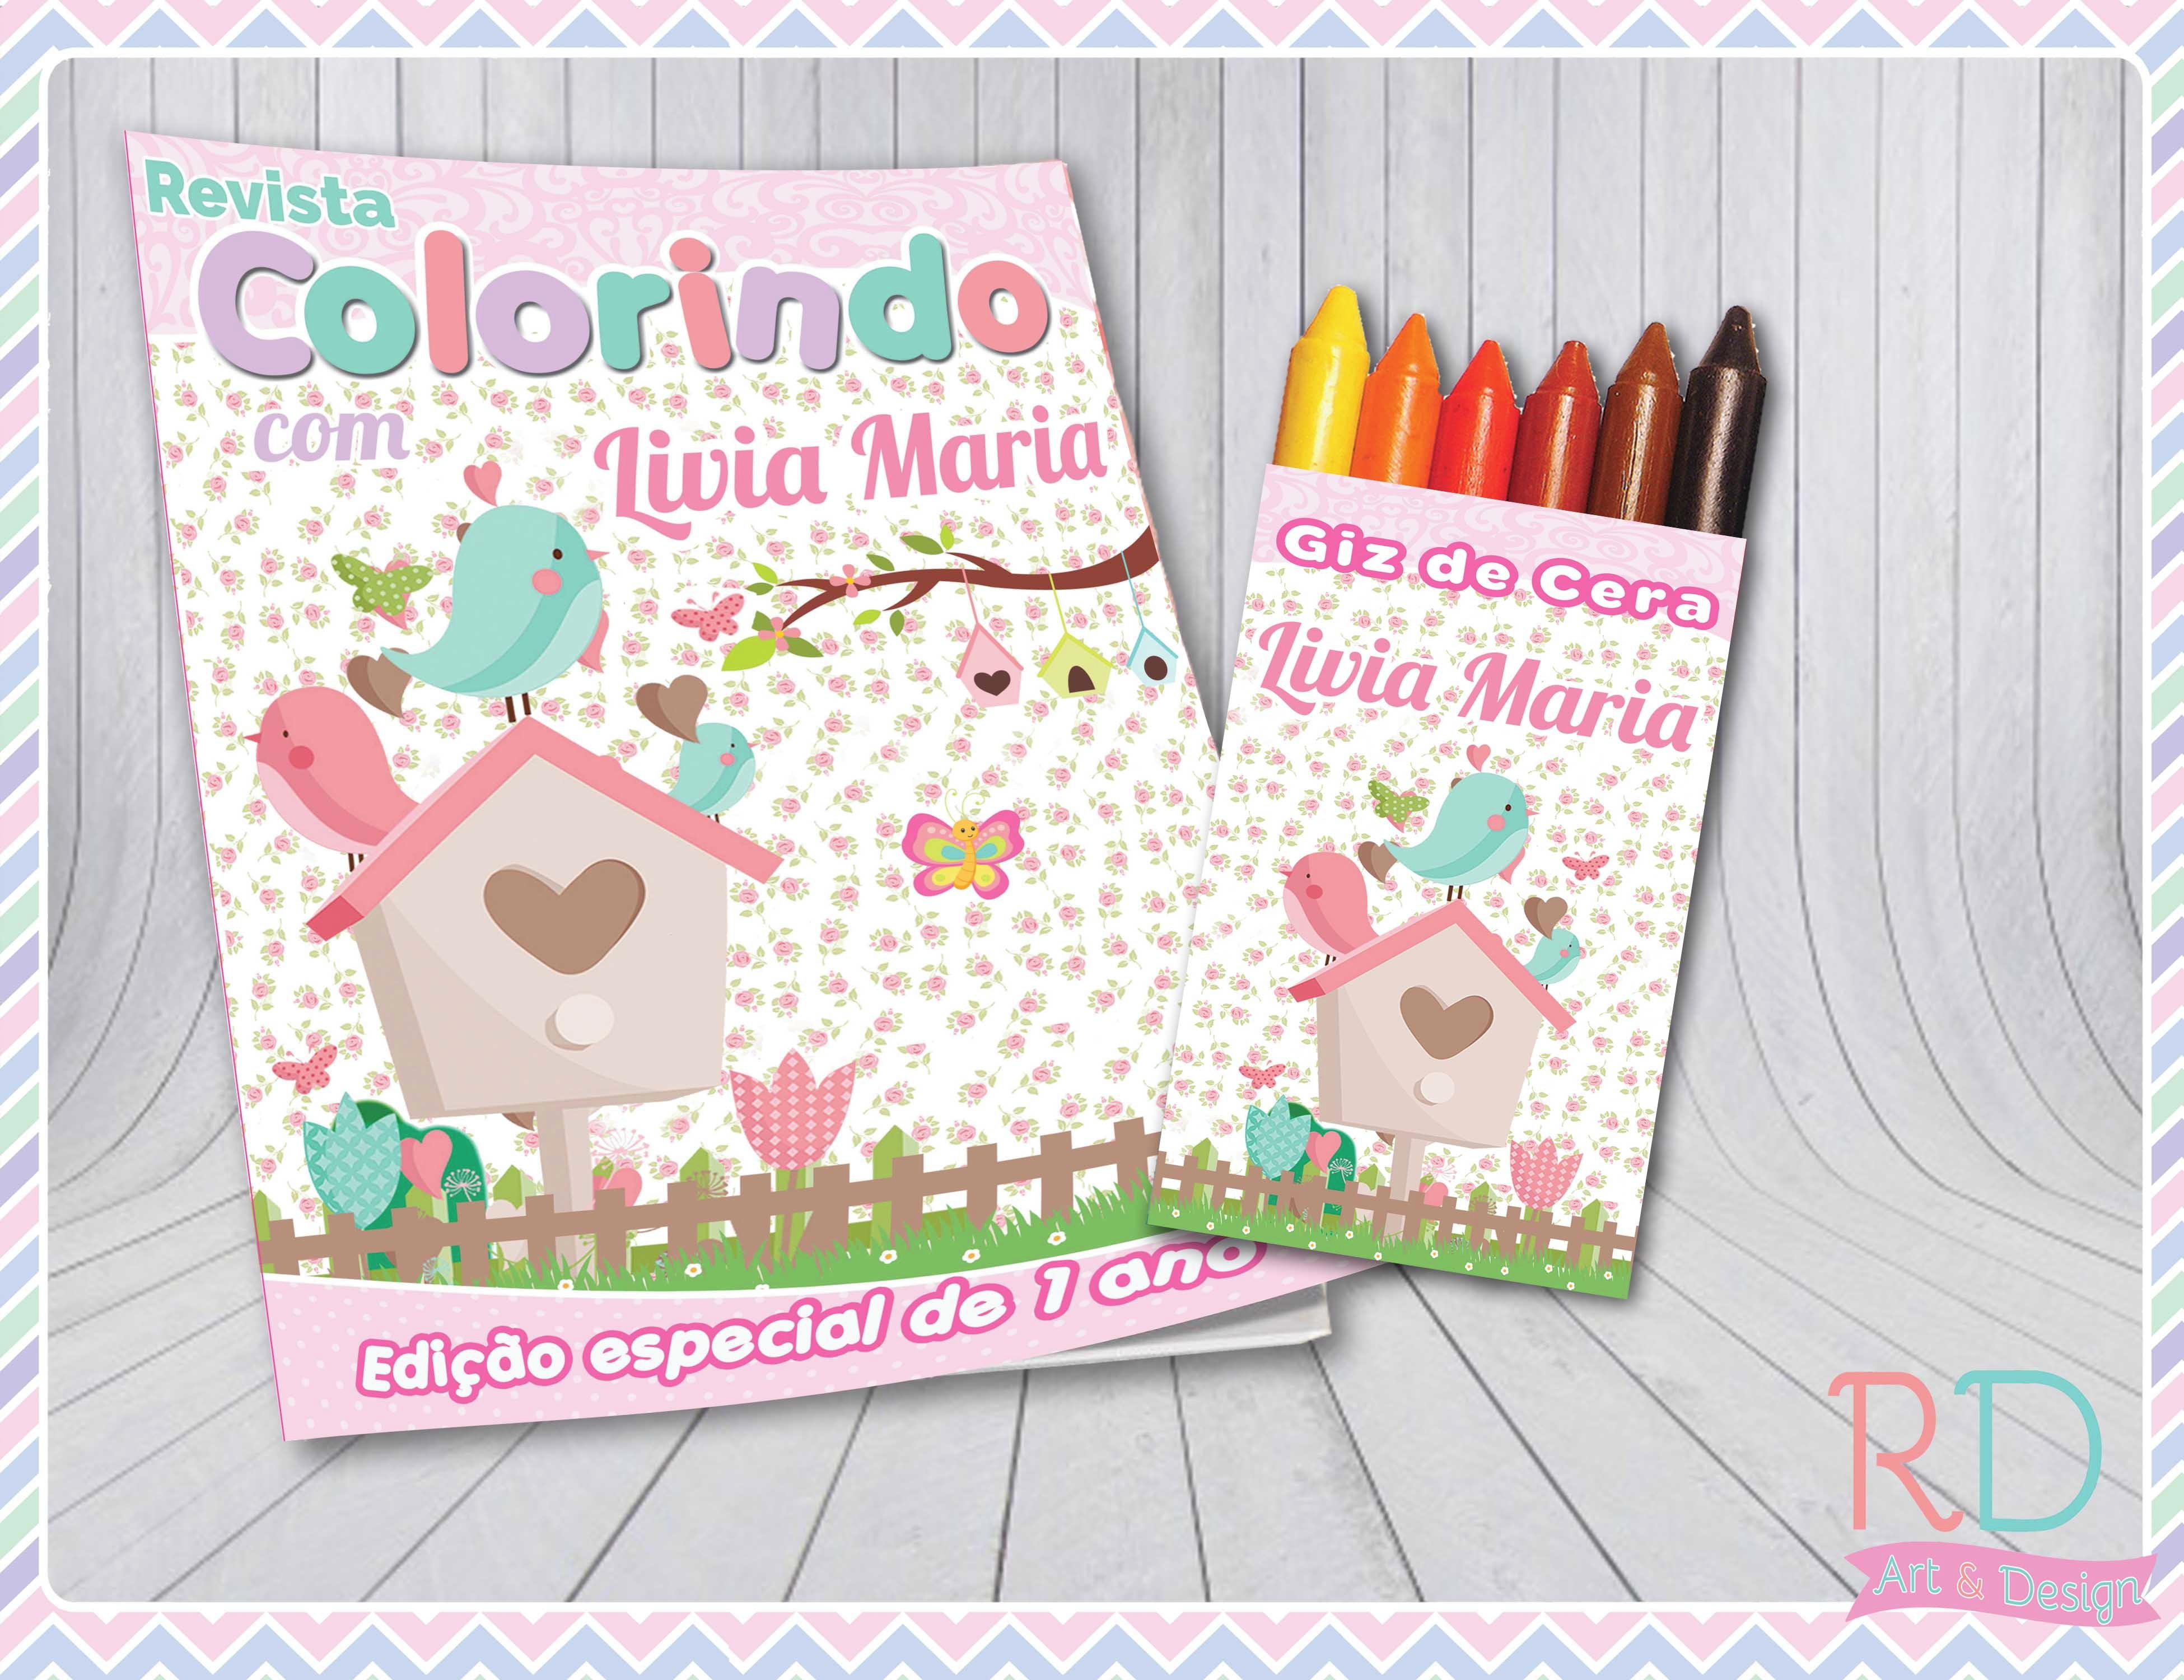 Kit Colorir Jardim Encantado No Elo7 Rd Art Design D49844